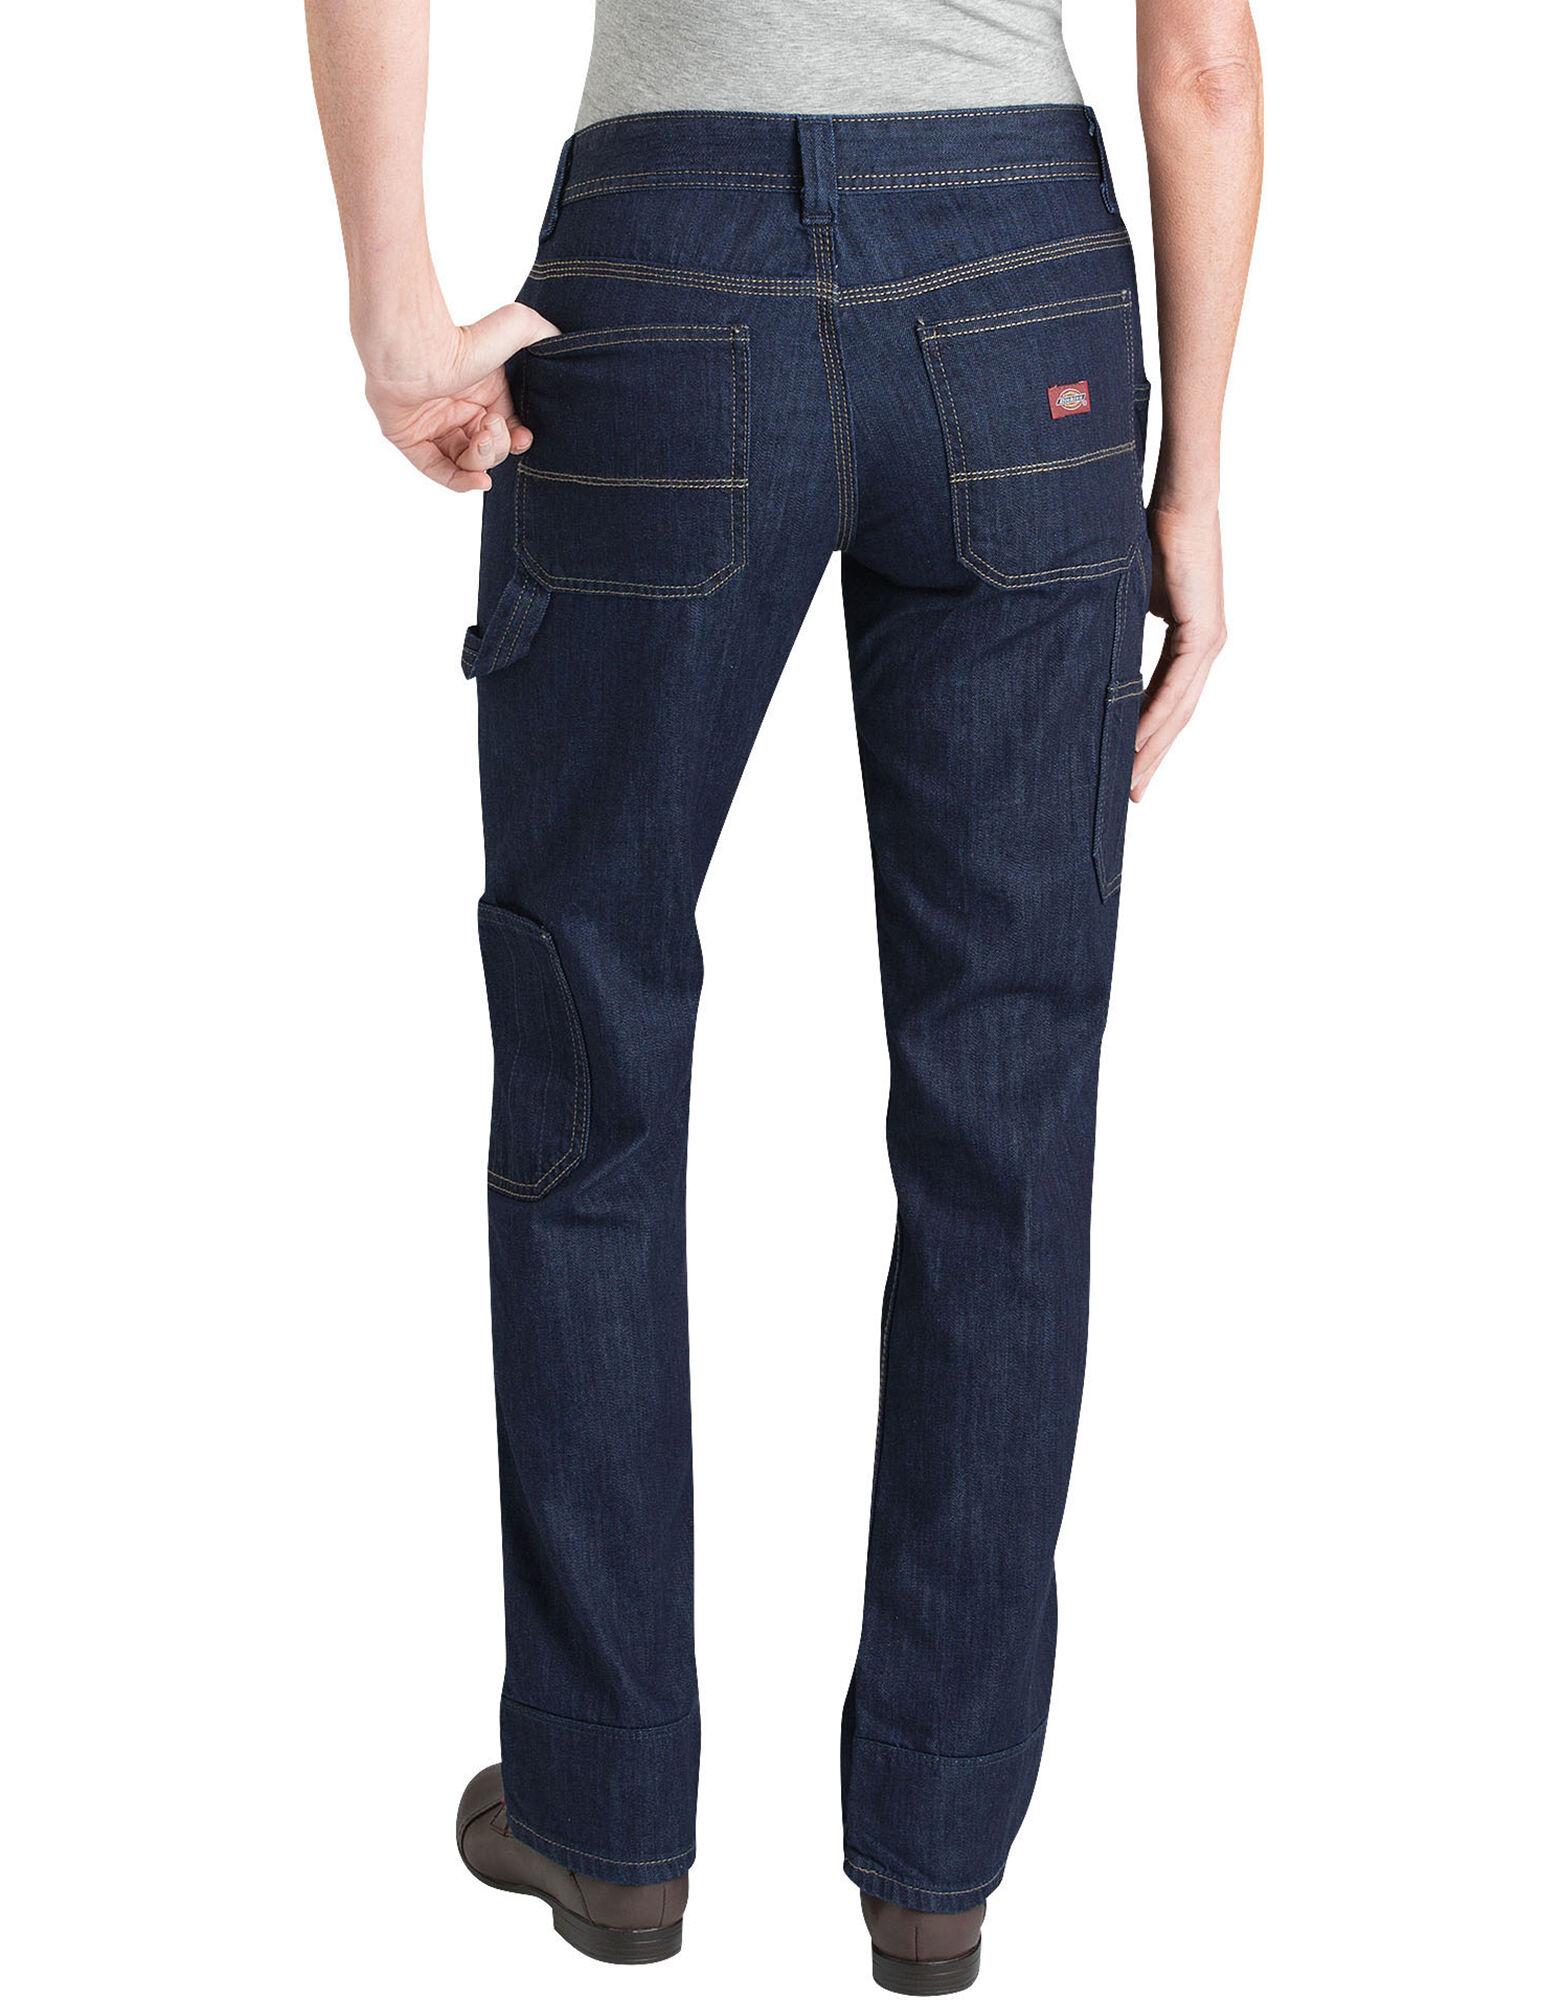 Women&39s Relaxed Fit Carpenter Denim Jean | Womens Jeans | Dickies